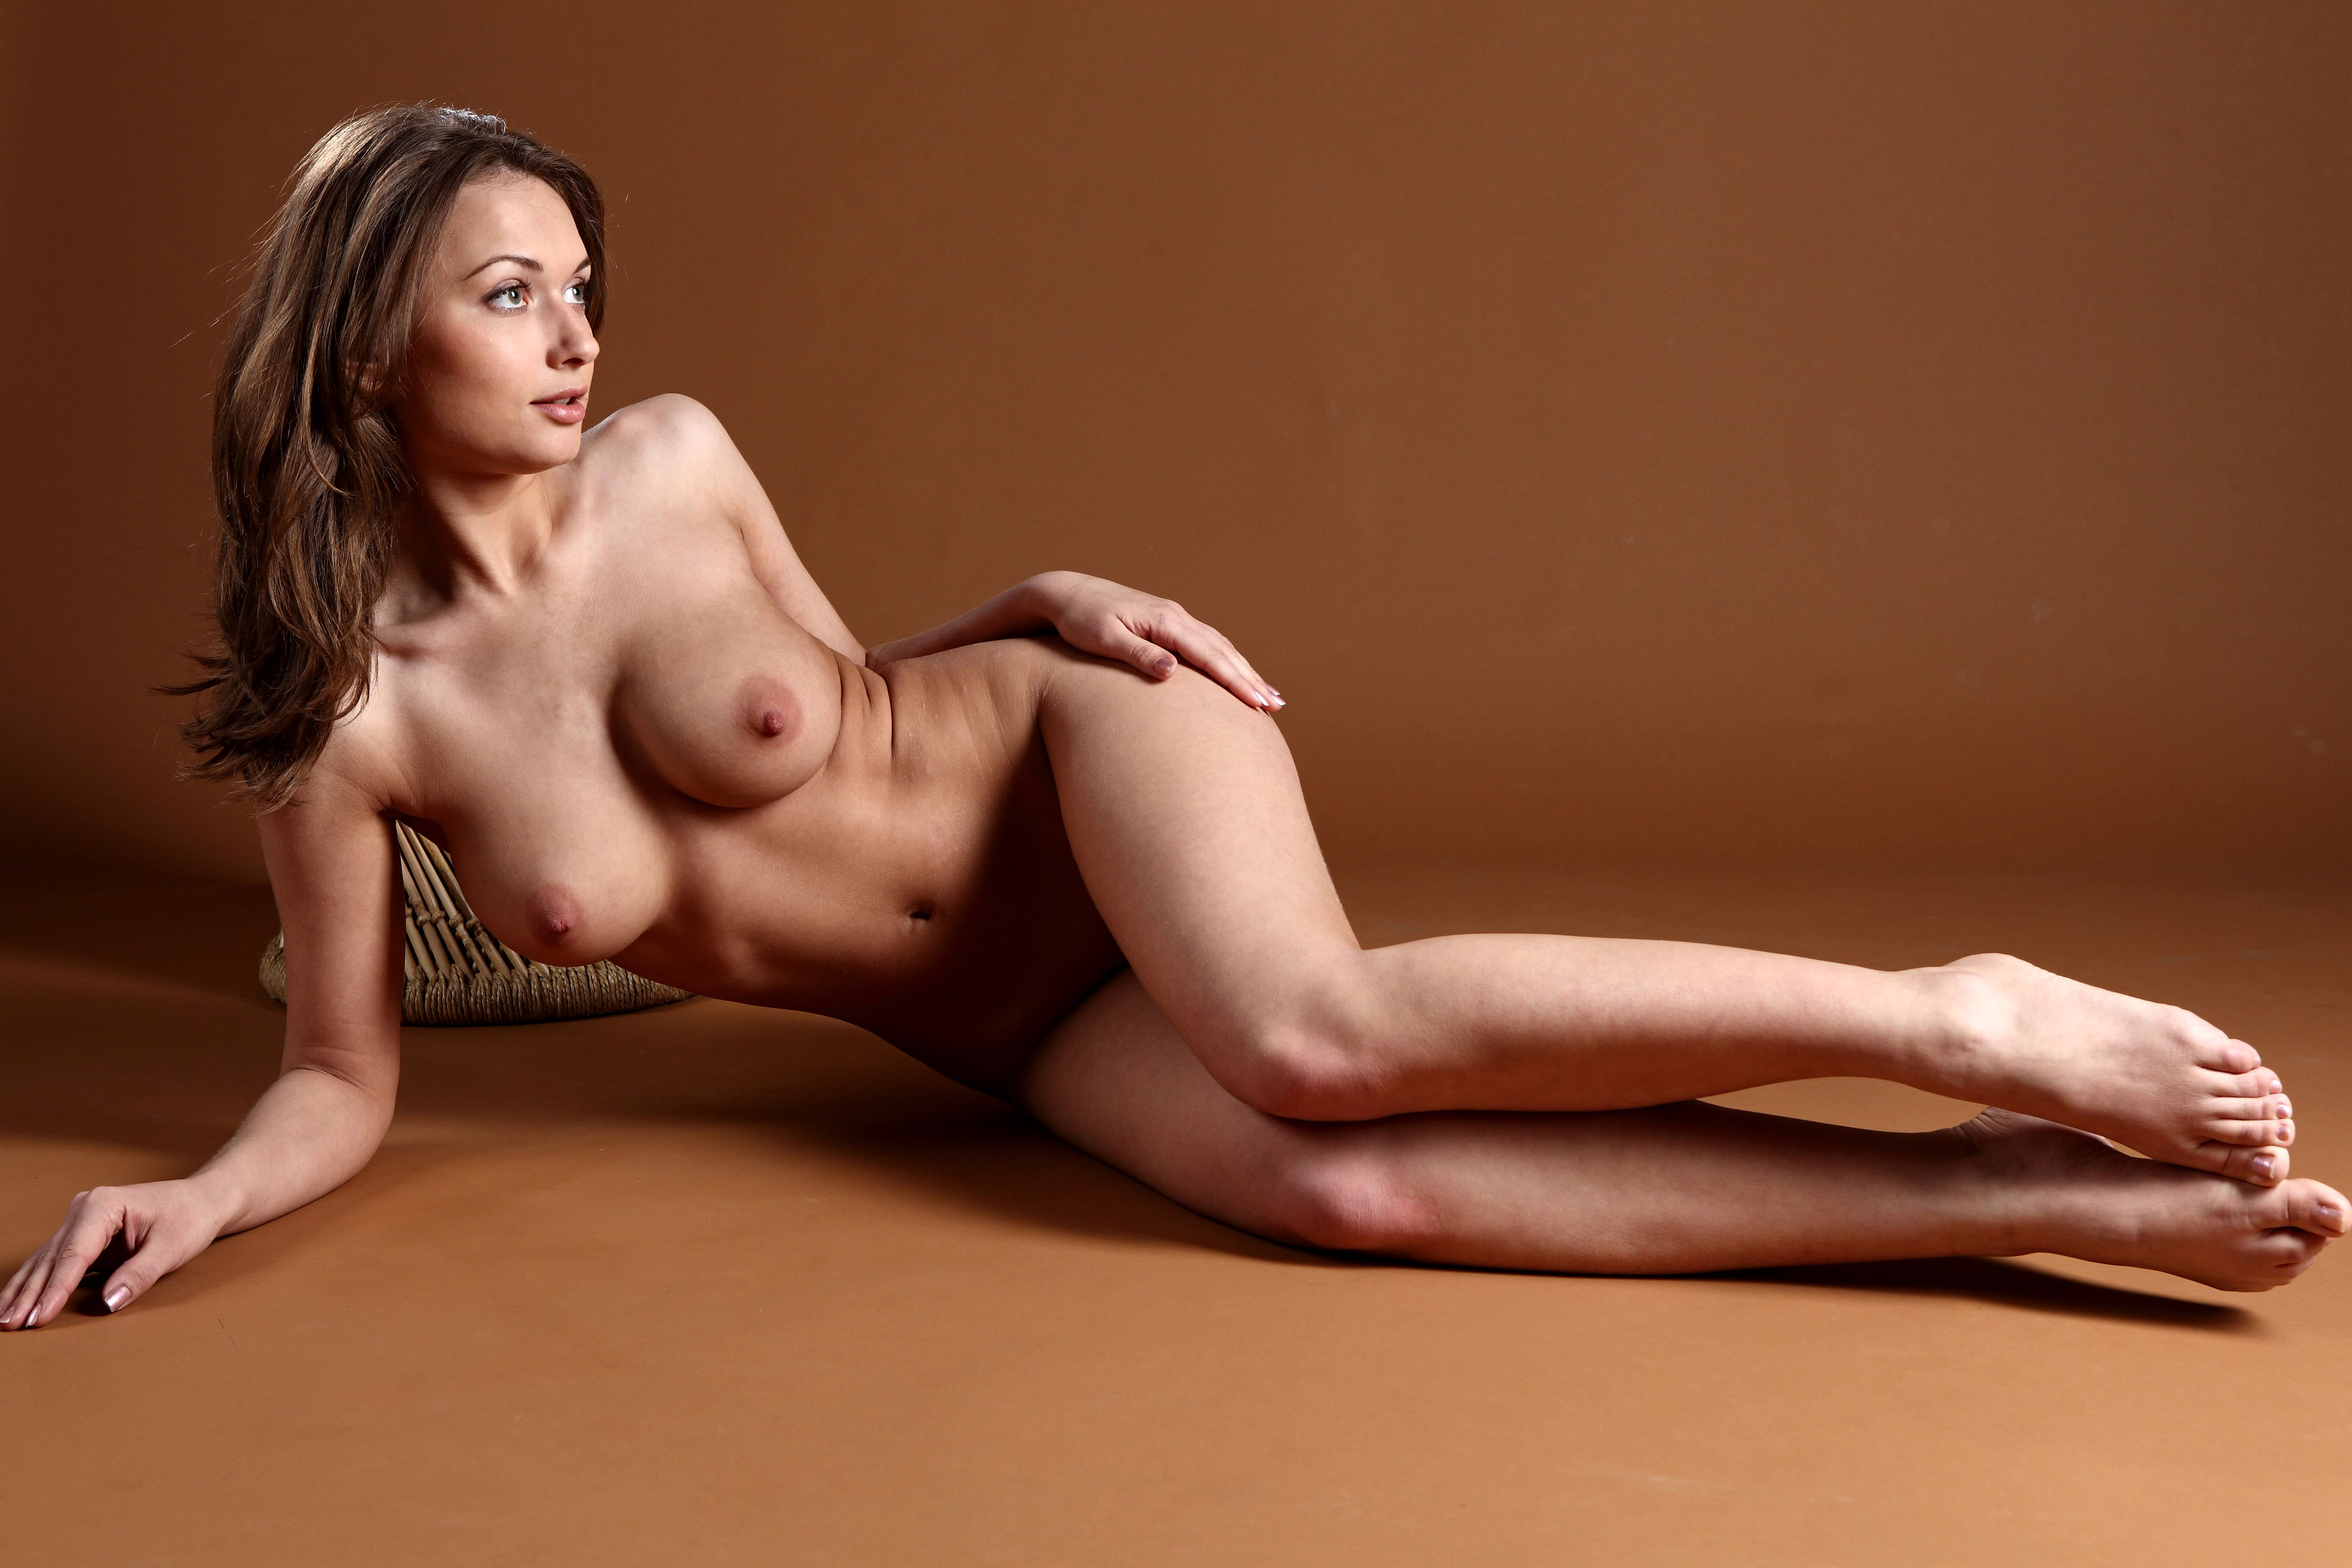 malaysian girls naked having sex